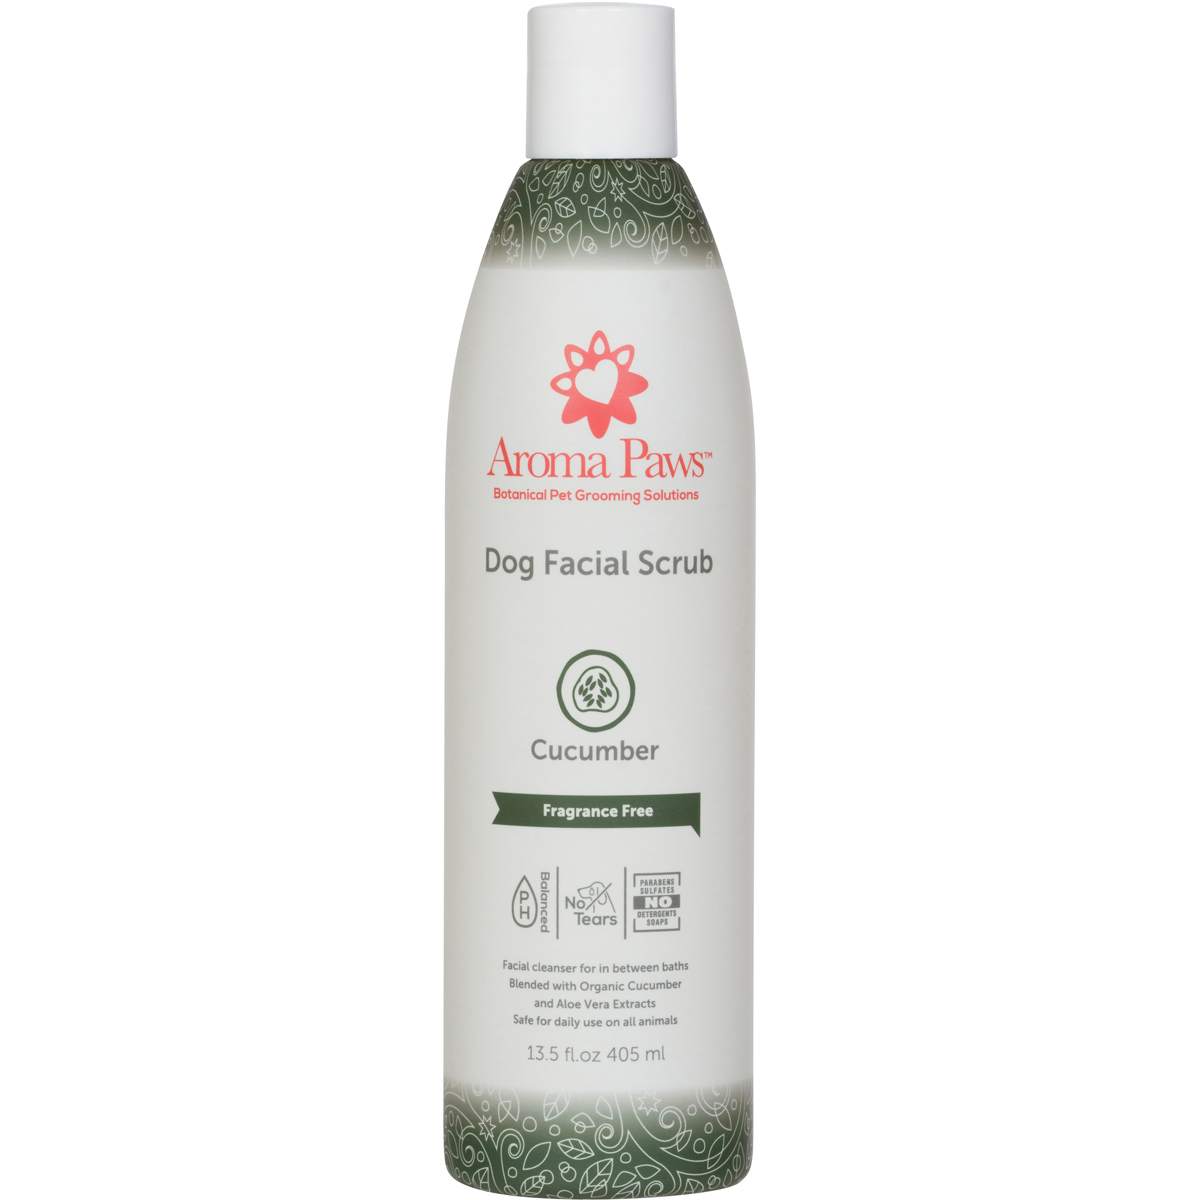 Aroma Paws Organic Cucumber & Aloe Facial Scrub, 13.5-oz